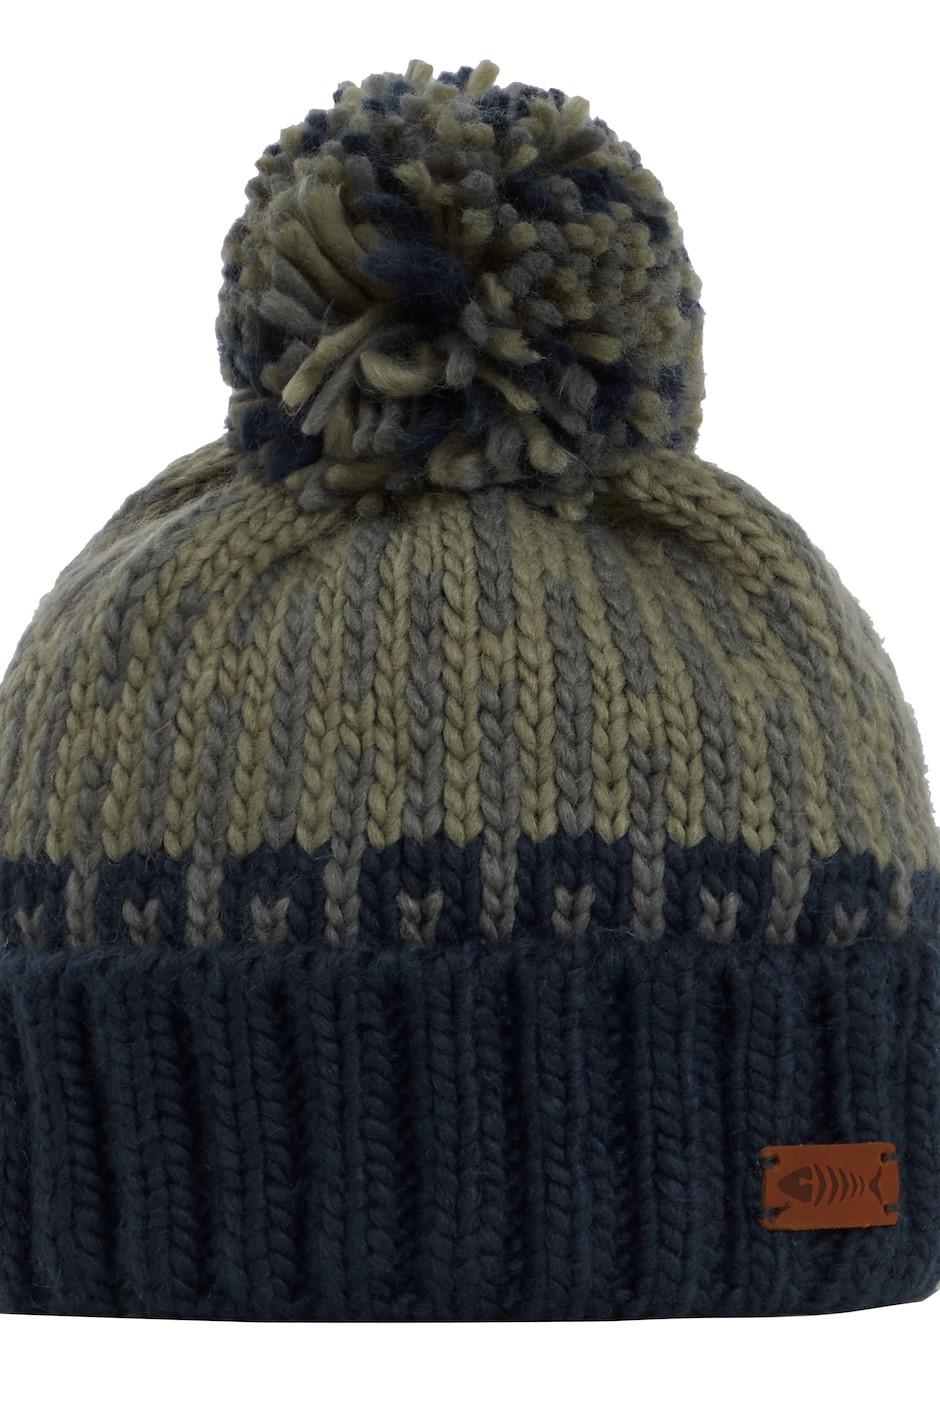 Kearney Fair Isle Knit Bobble Hat Khaki Grey